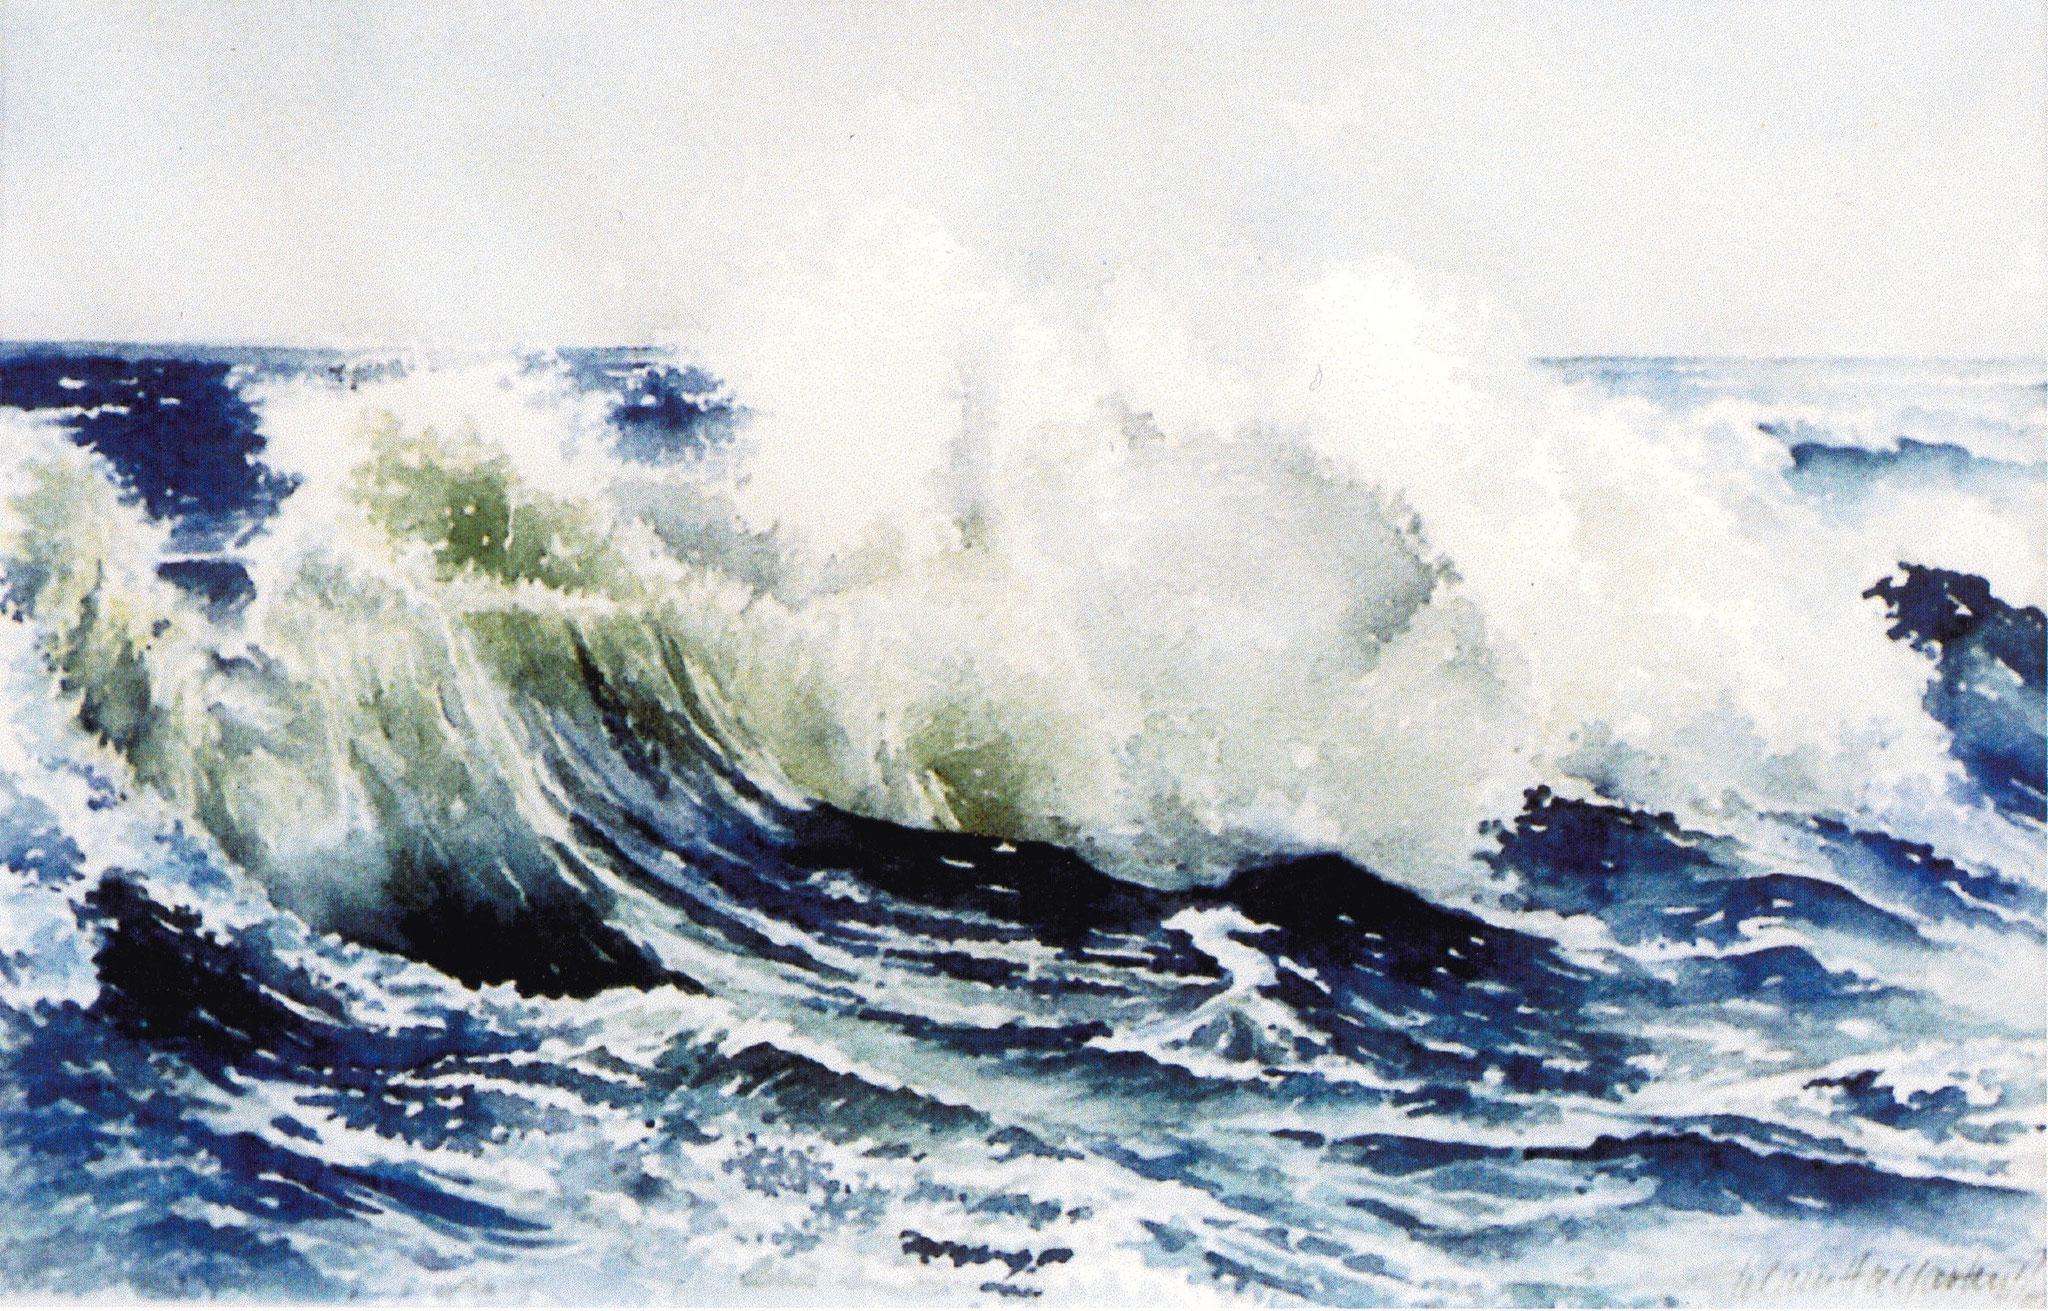 ' Große Welle ' Aquarell, 30 x 45 cm, 1983